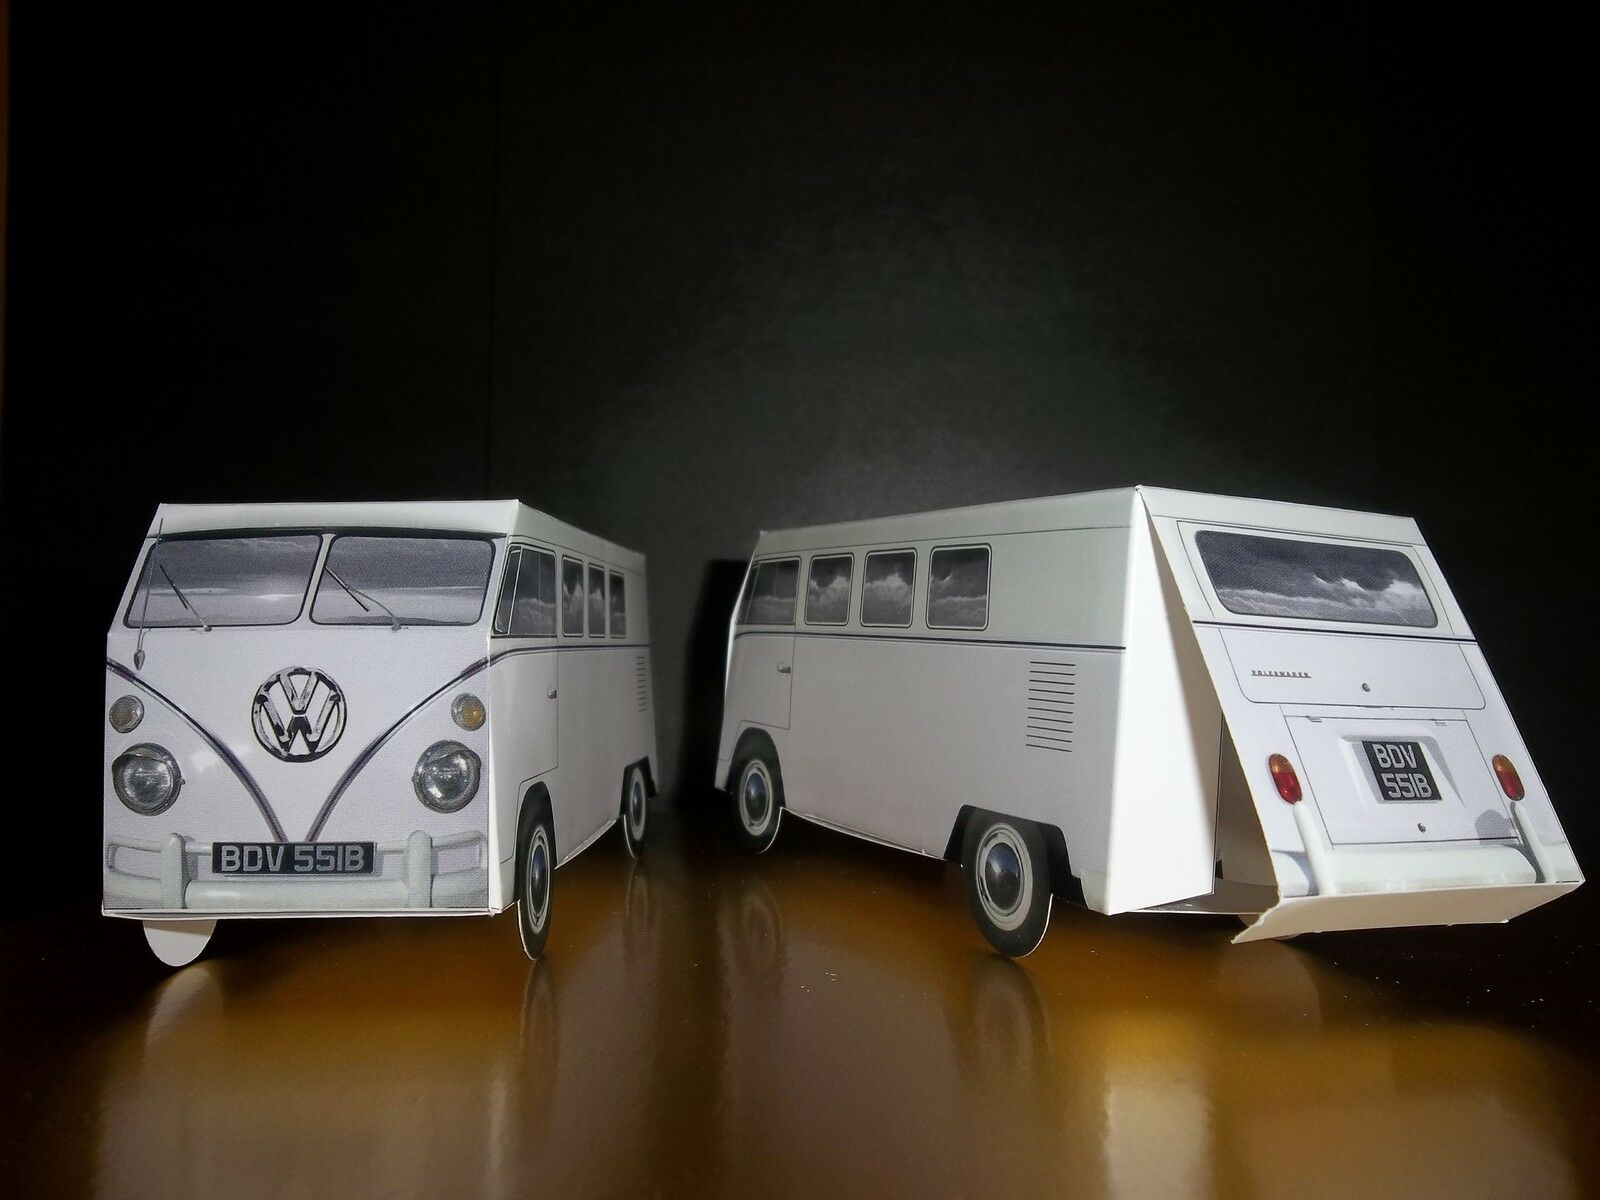 100 X Blanc VW écran Camper Van Faveur Nuptiale VW Party Box Sweet Box